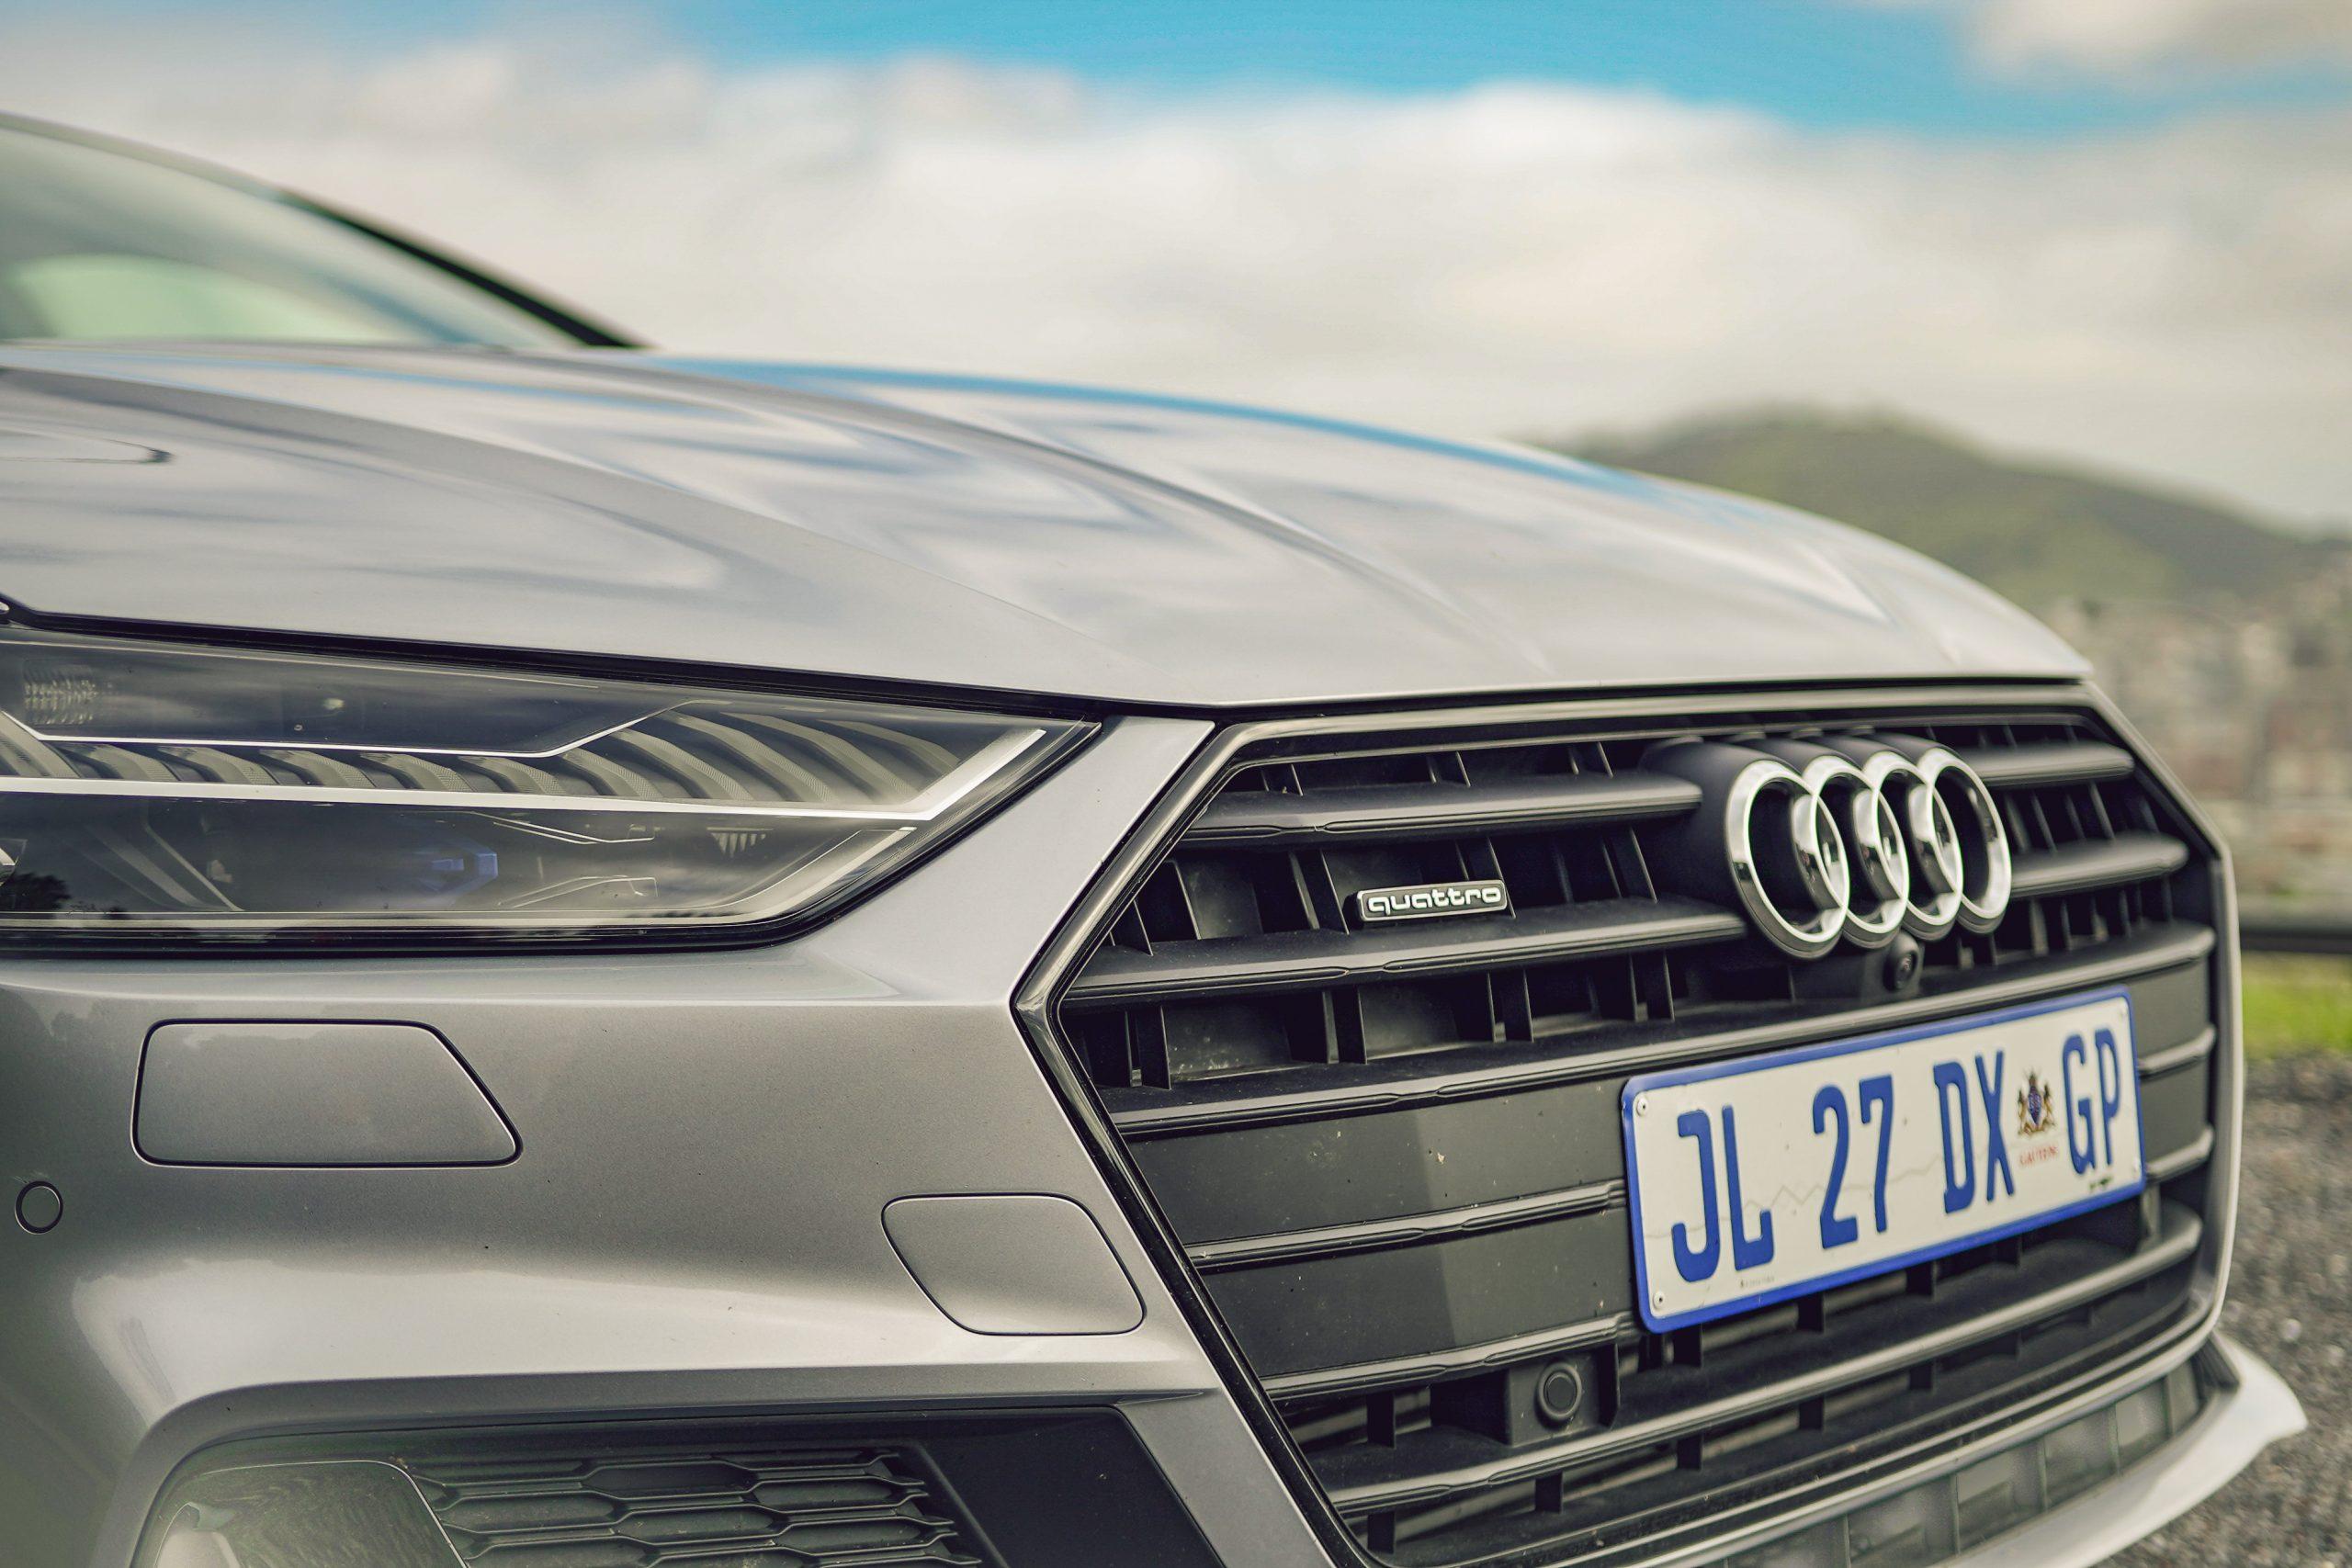 Audi A7 55 TFSI grille